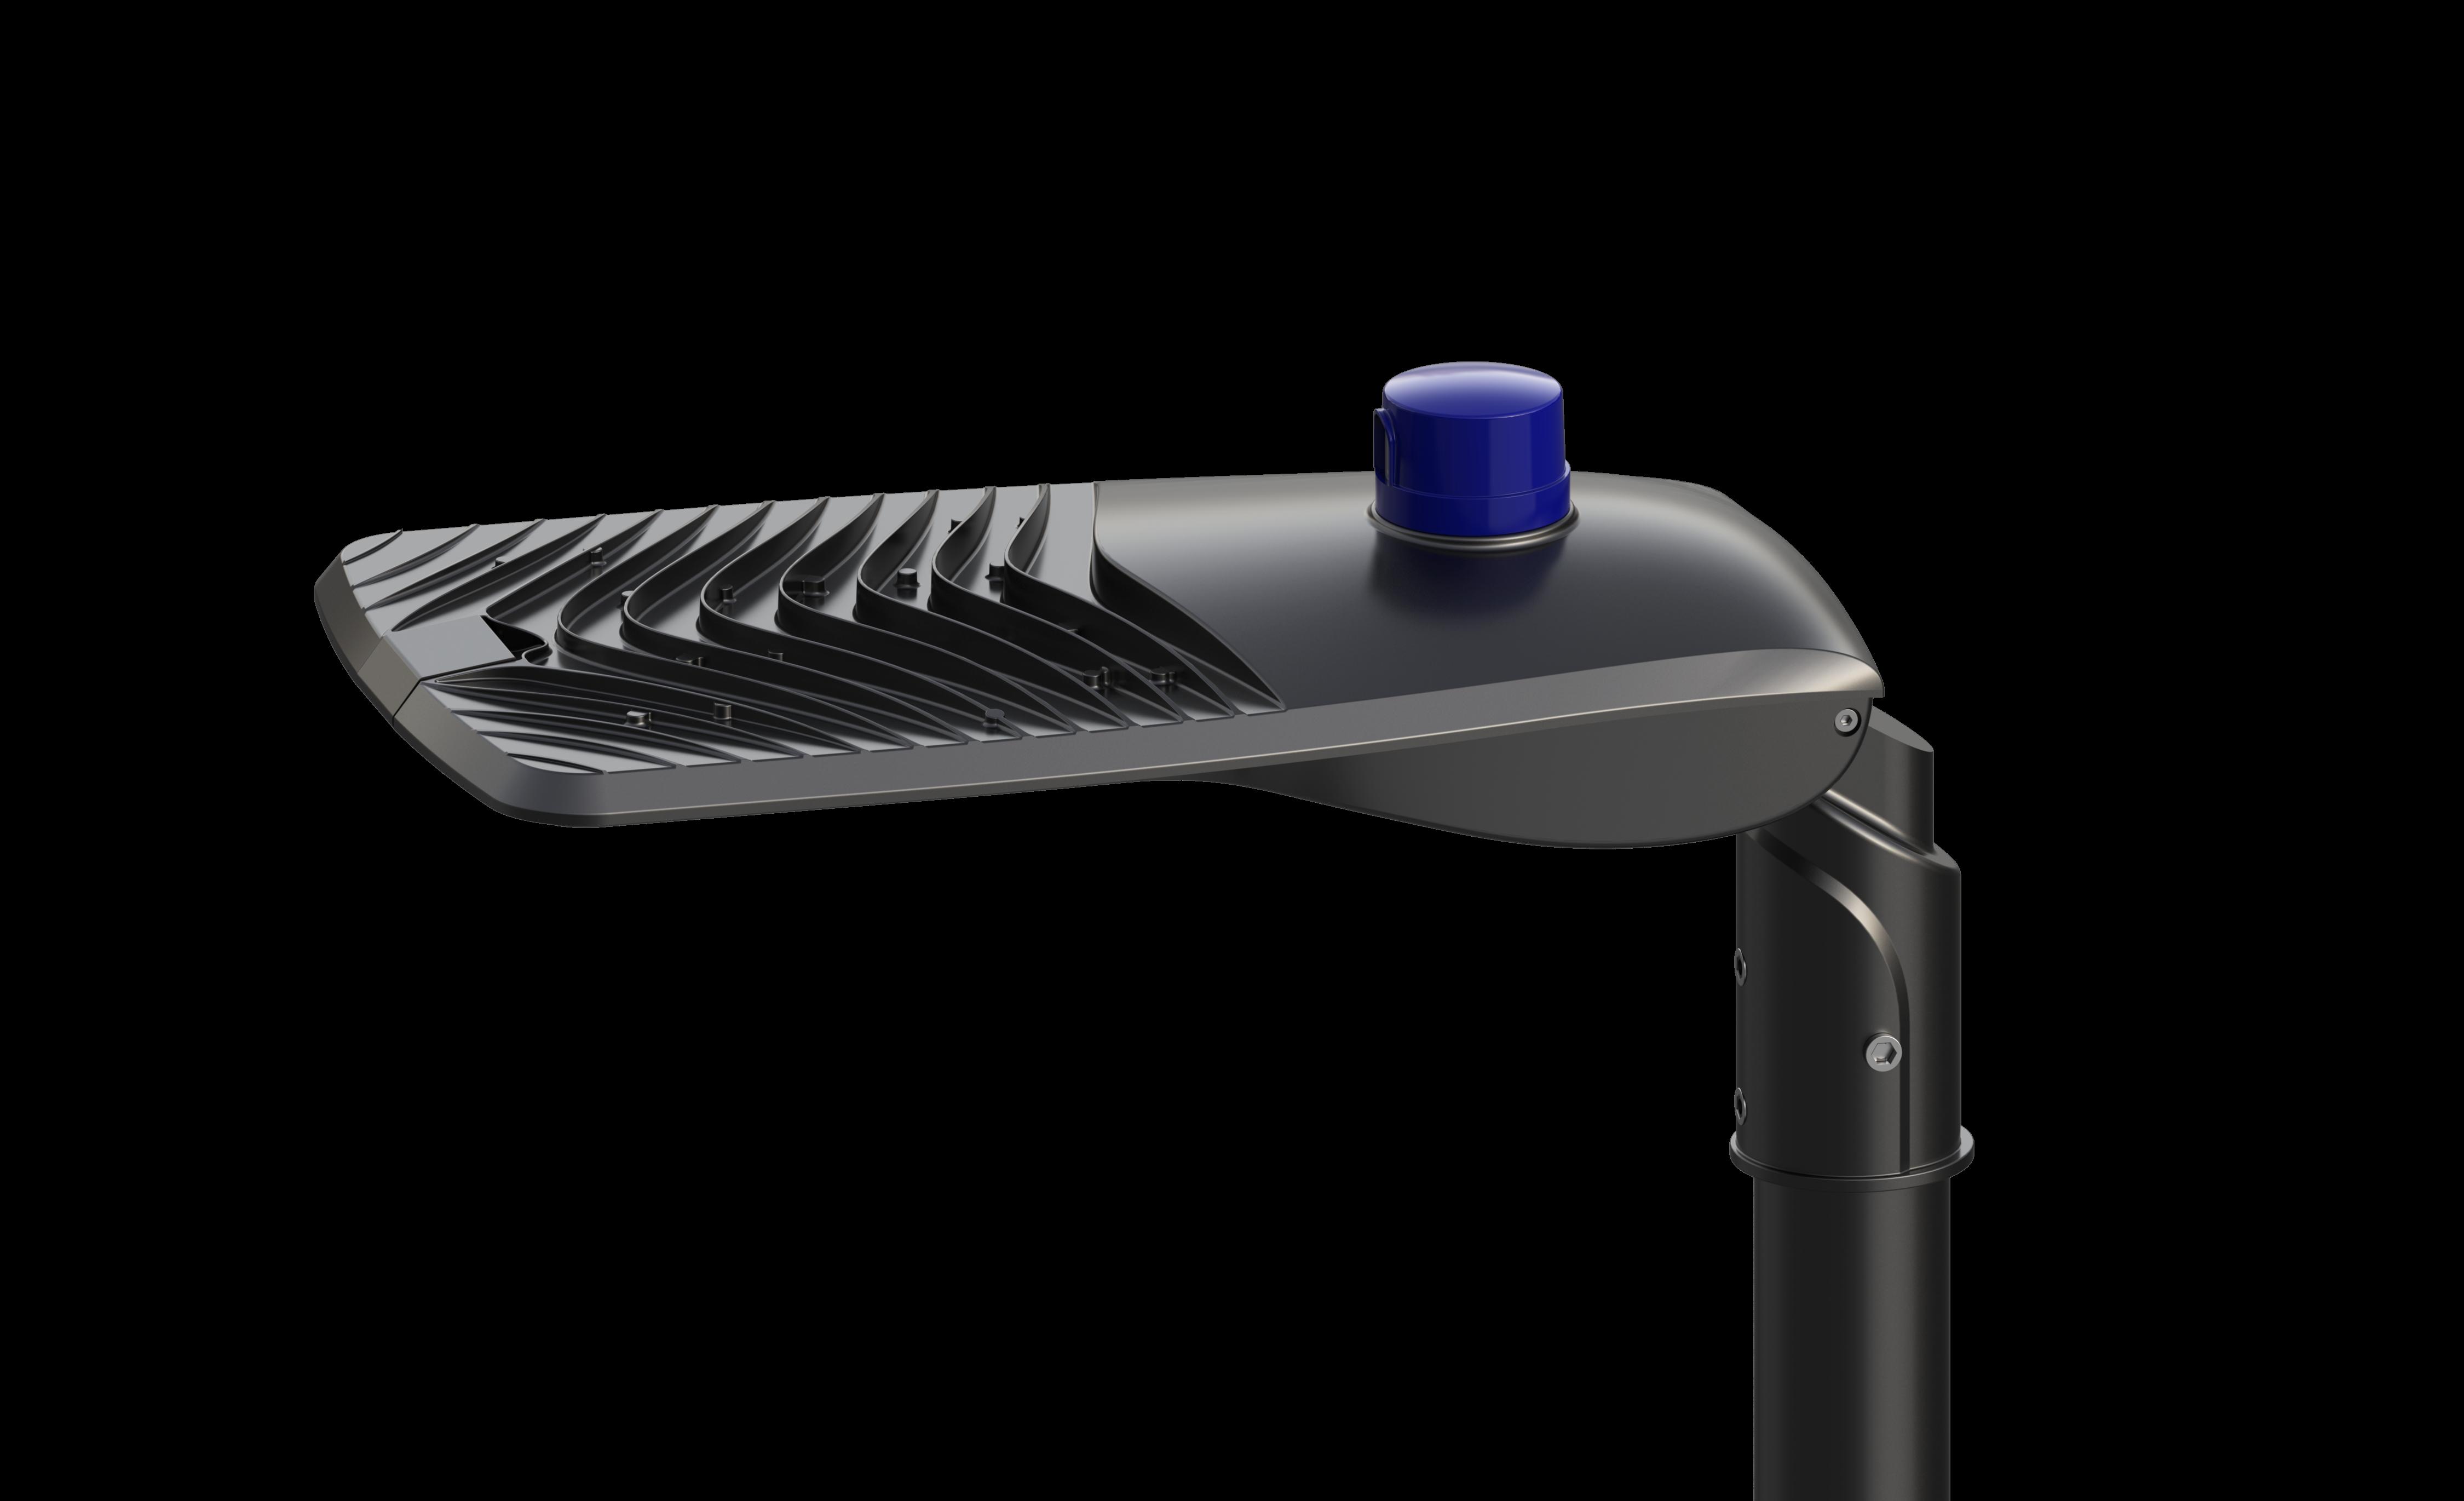 LED Street Light 180W - 6500K - 21,600 Lumens - IP66 - Black